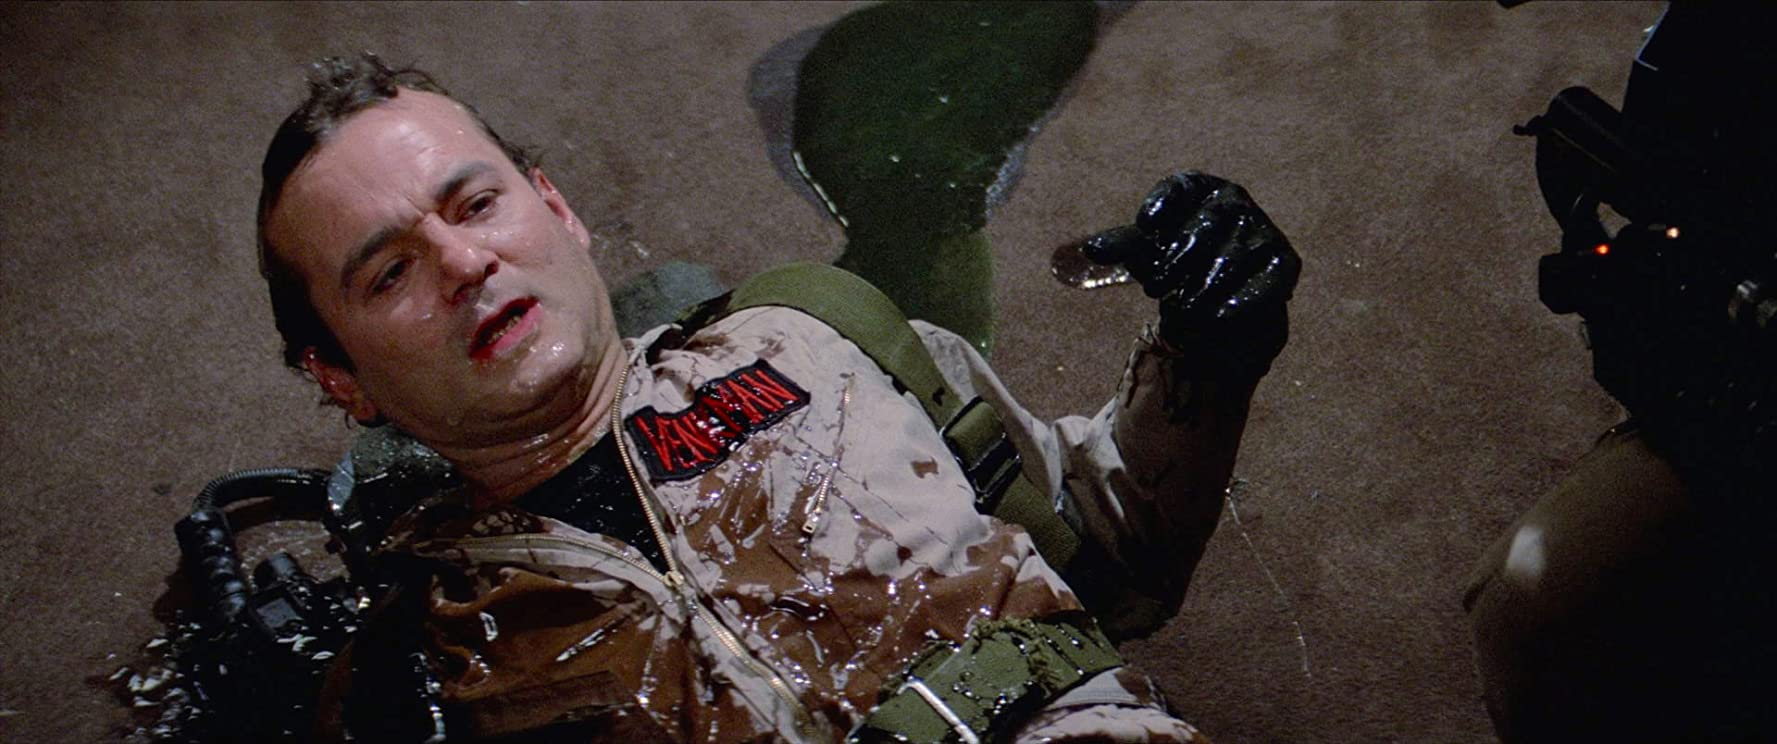 Bill Murray in Ghostbusters (1984)